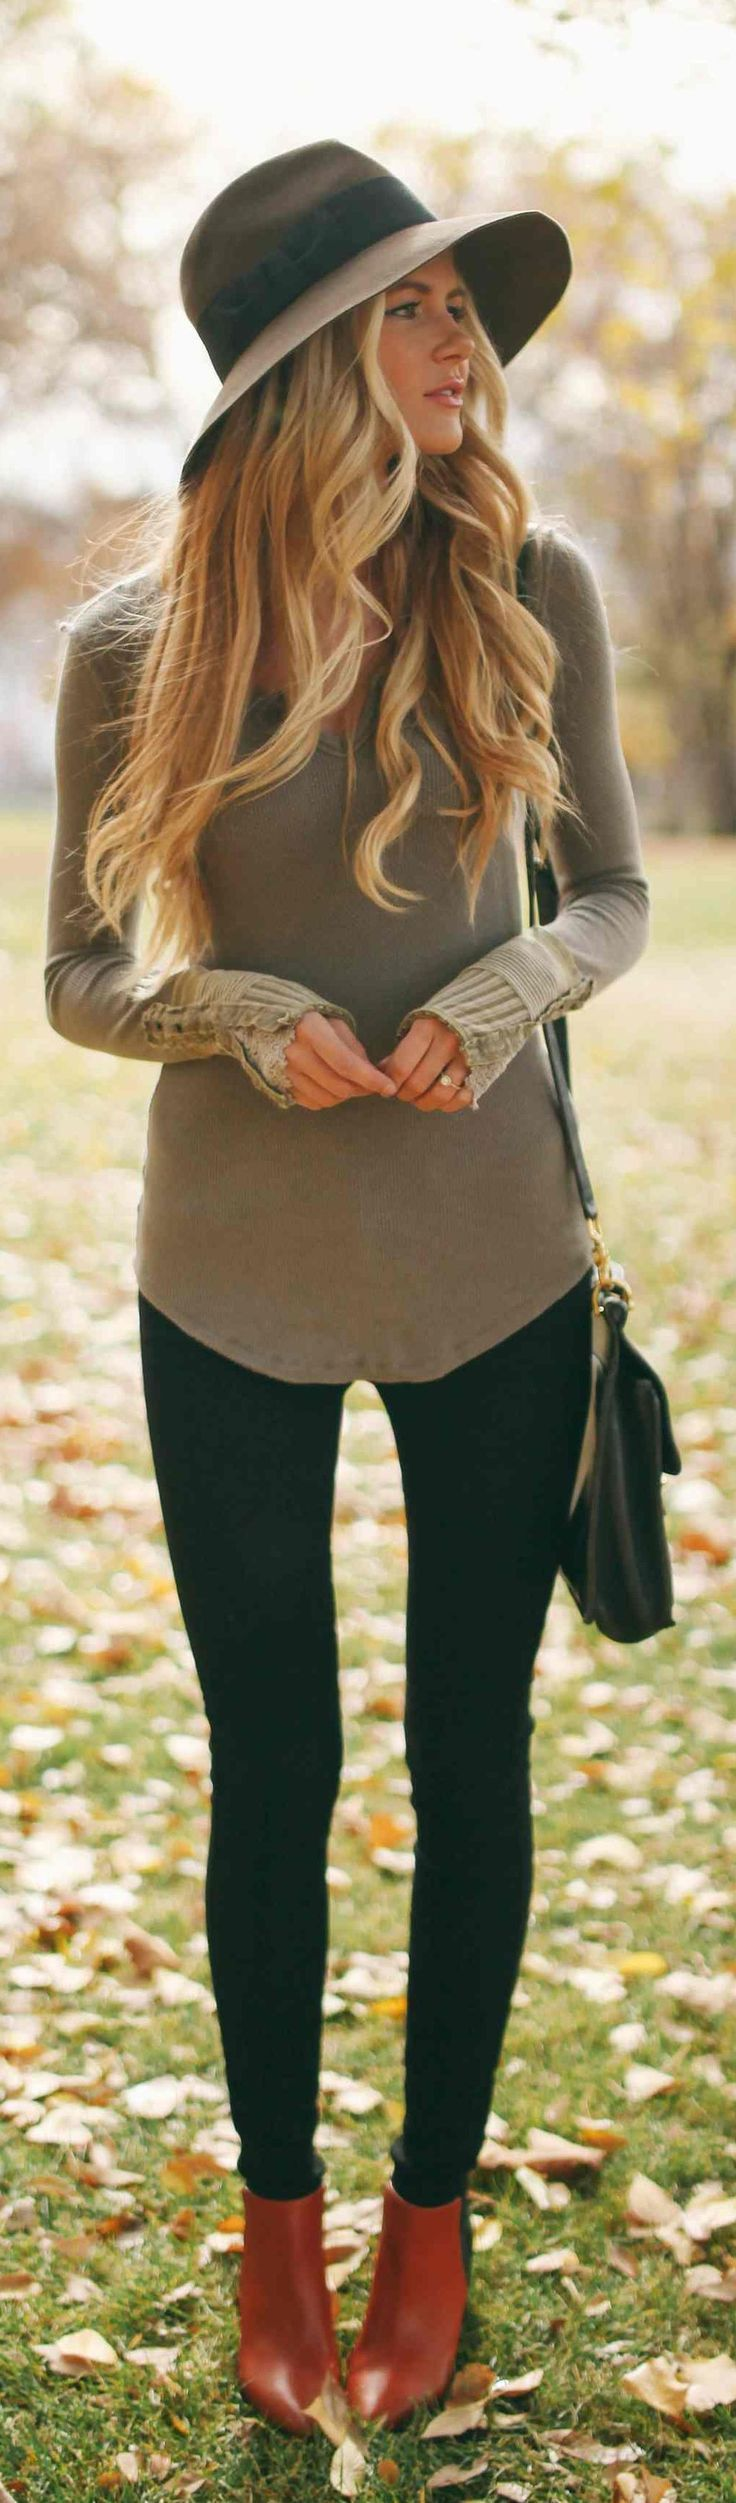 Modern Country Style Modern Country Style Fashion For Autumn Fall